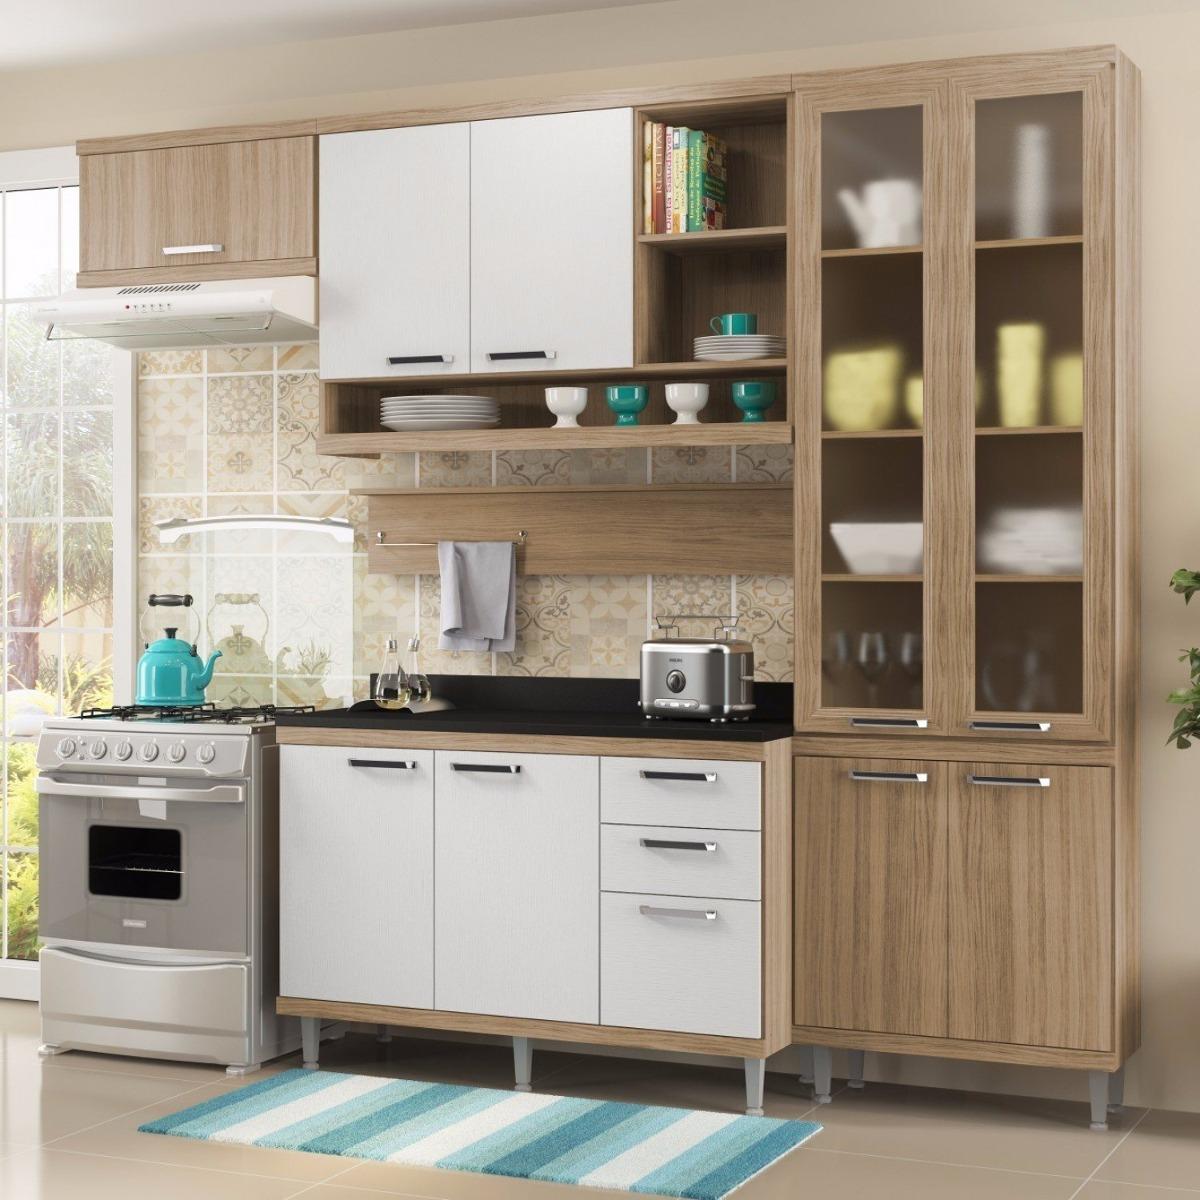 Cozinha Completa 6 Pe As Sic Lia S9t Multim Veis Ei R 1 789 90 Em